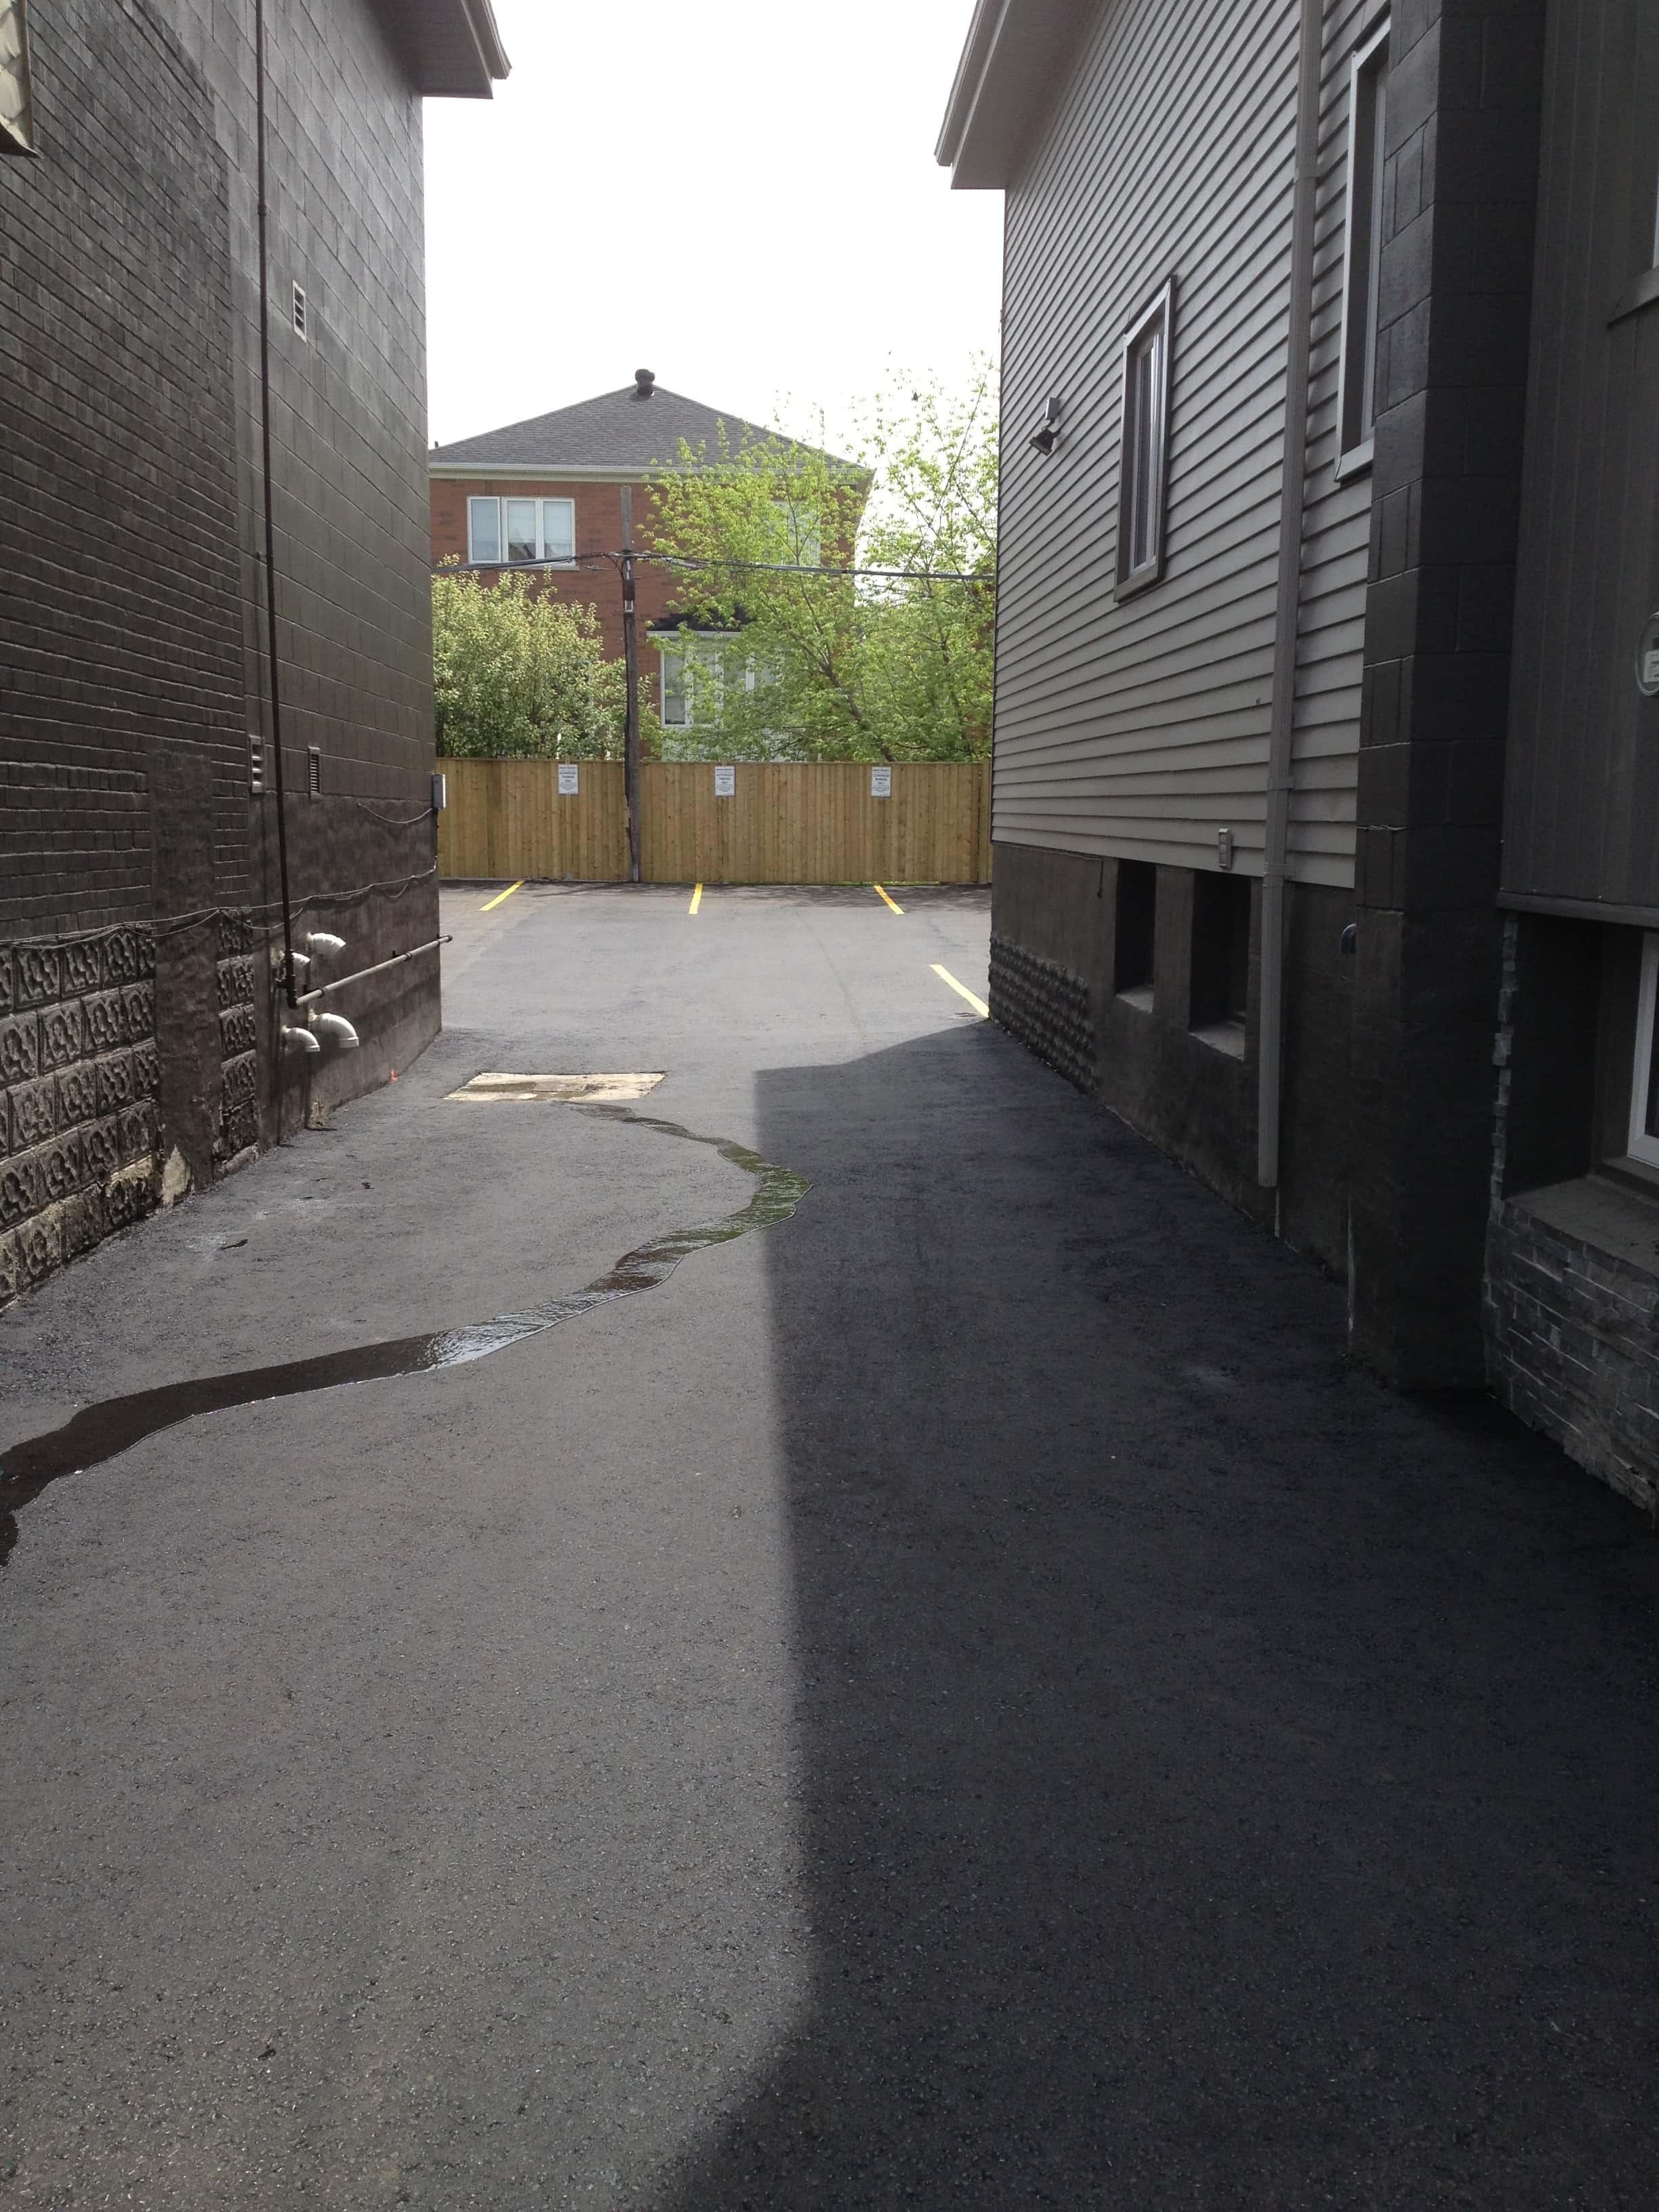 Asphalt Paving Private Laneway and Parking Lot Mississauga